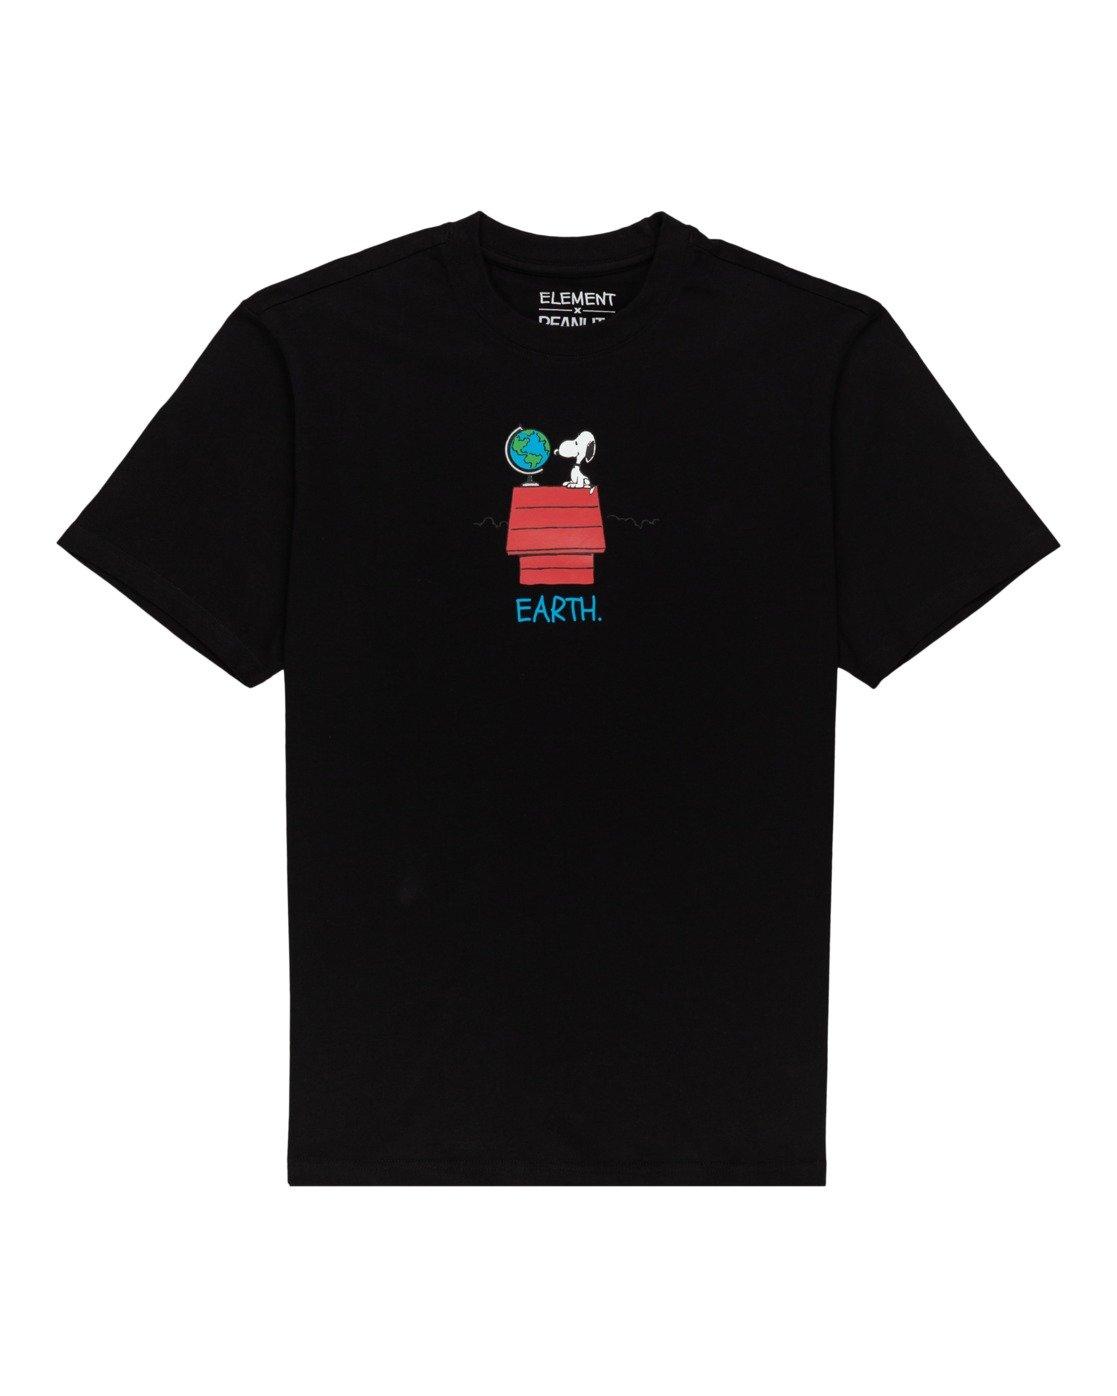 0 Peanuts Element - T-Shirt for Men Black W1SSO5ELP1 Element